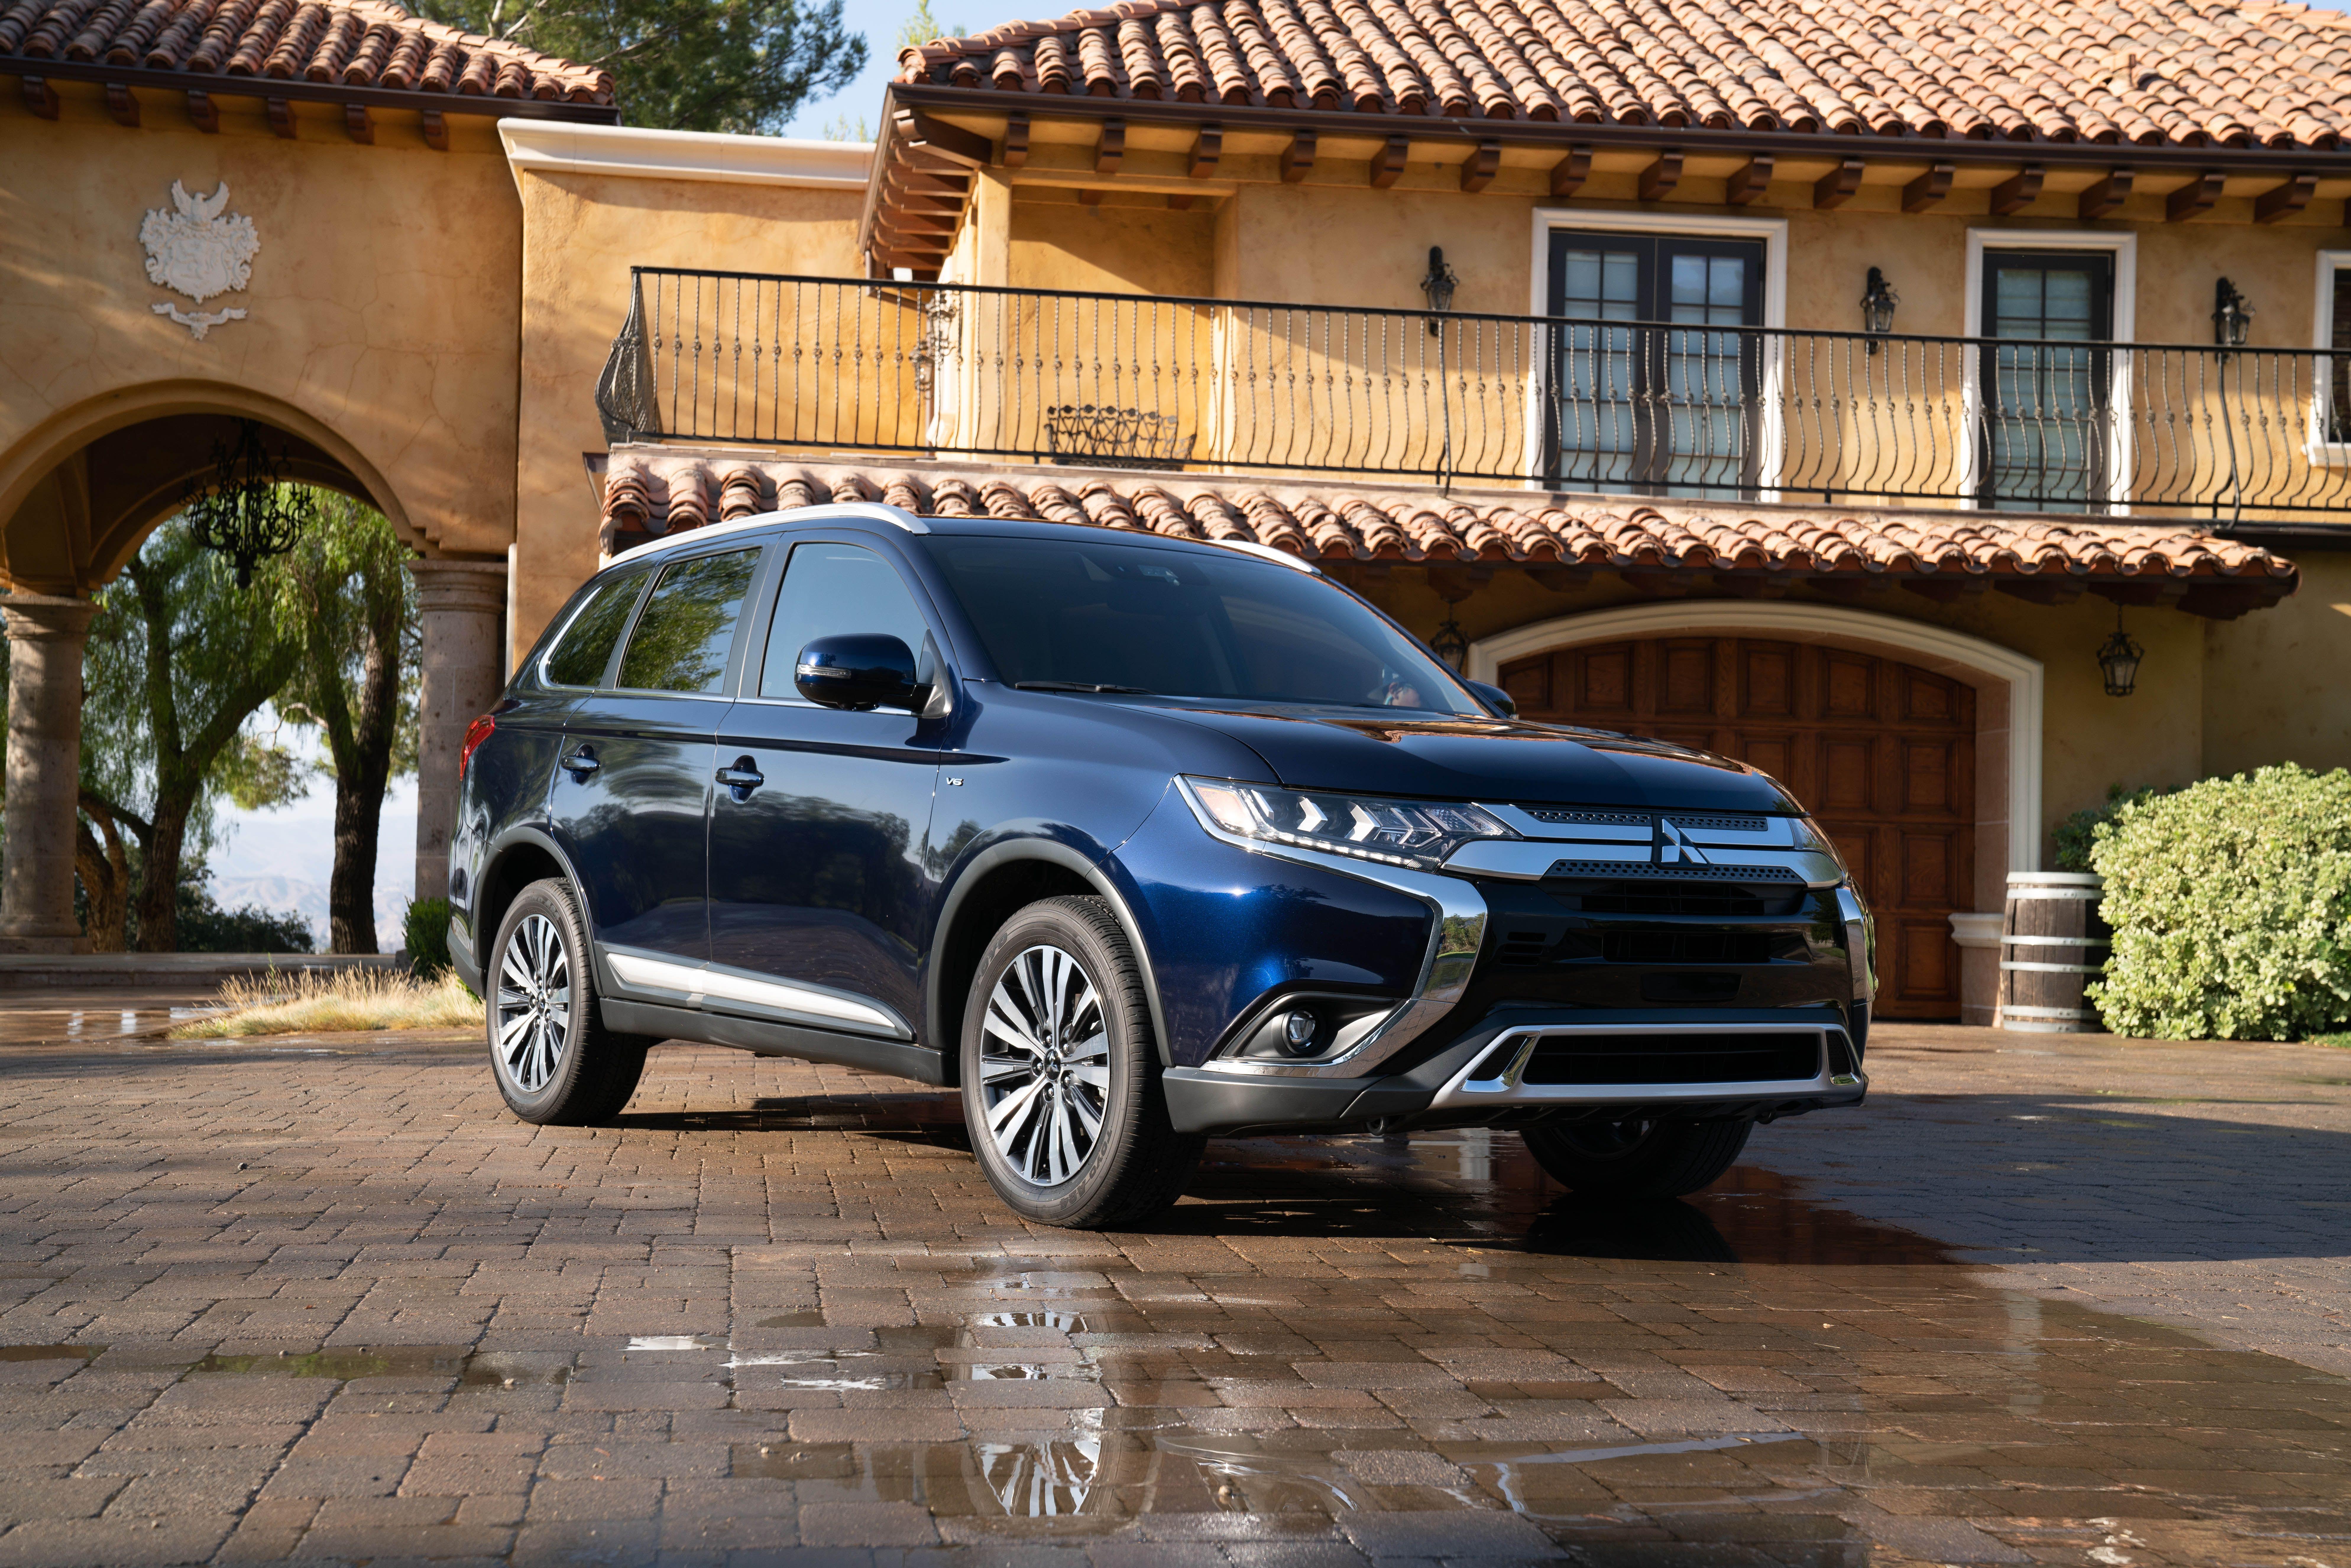 2020 Mitsubishi Outlander Gt Review